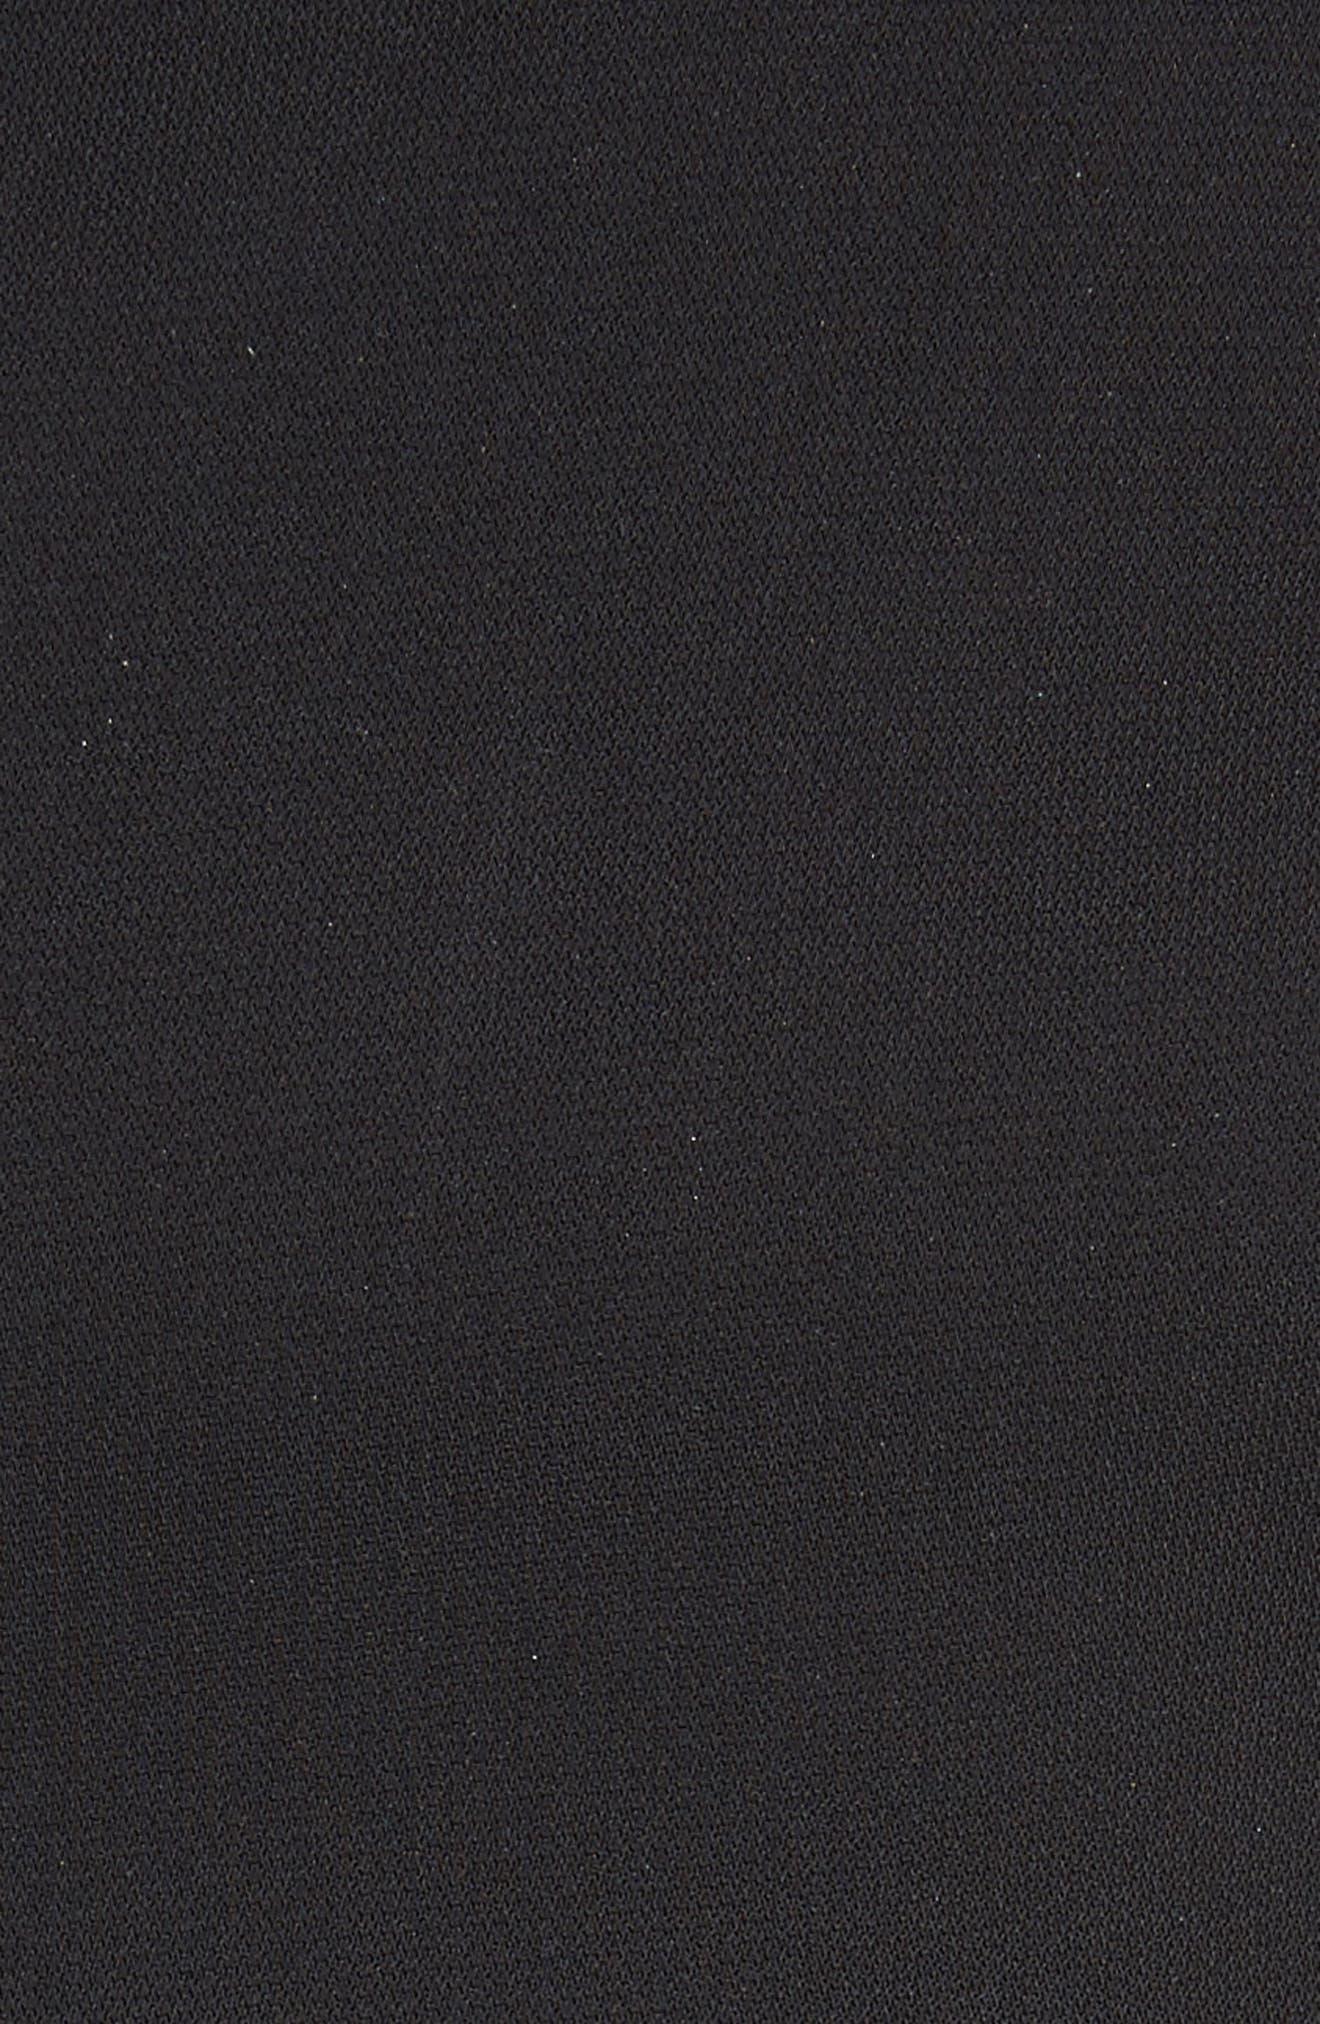 Elettra Ruffle Front Bonded Crepe Halter Dress,                             Alternate thumbnail 6, color,                             Black/ Graphite